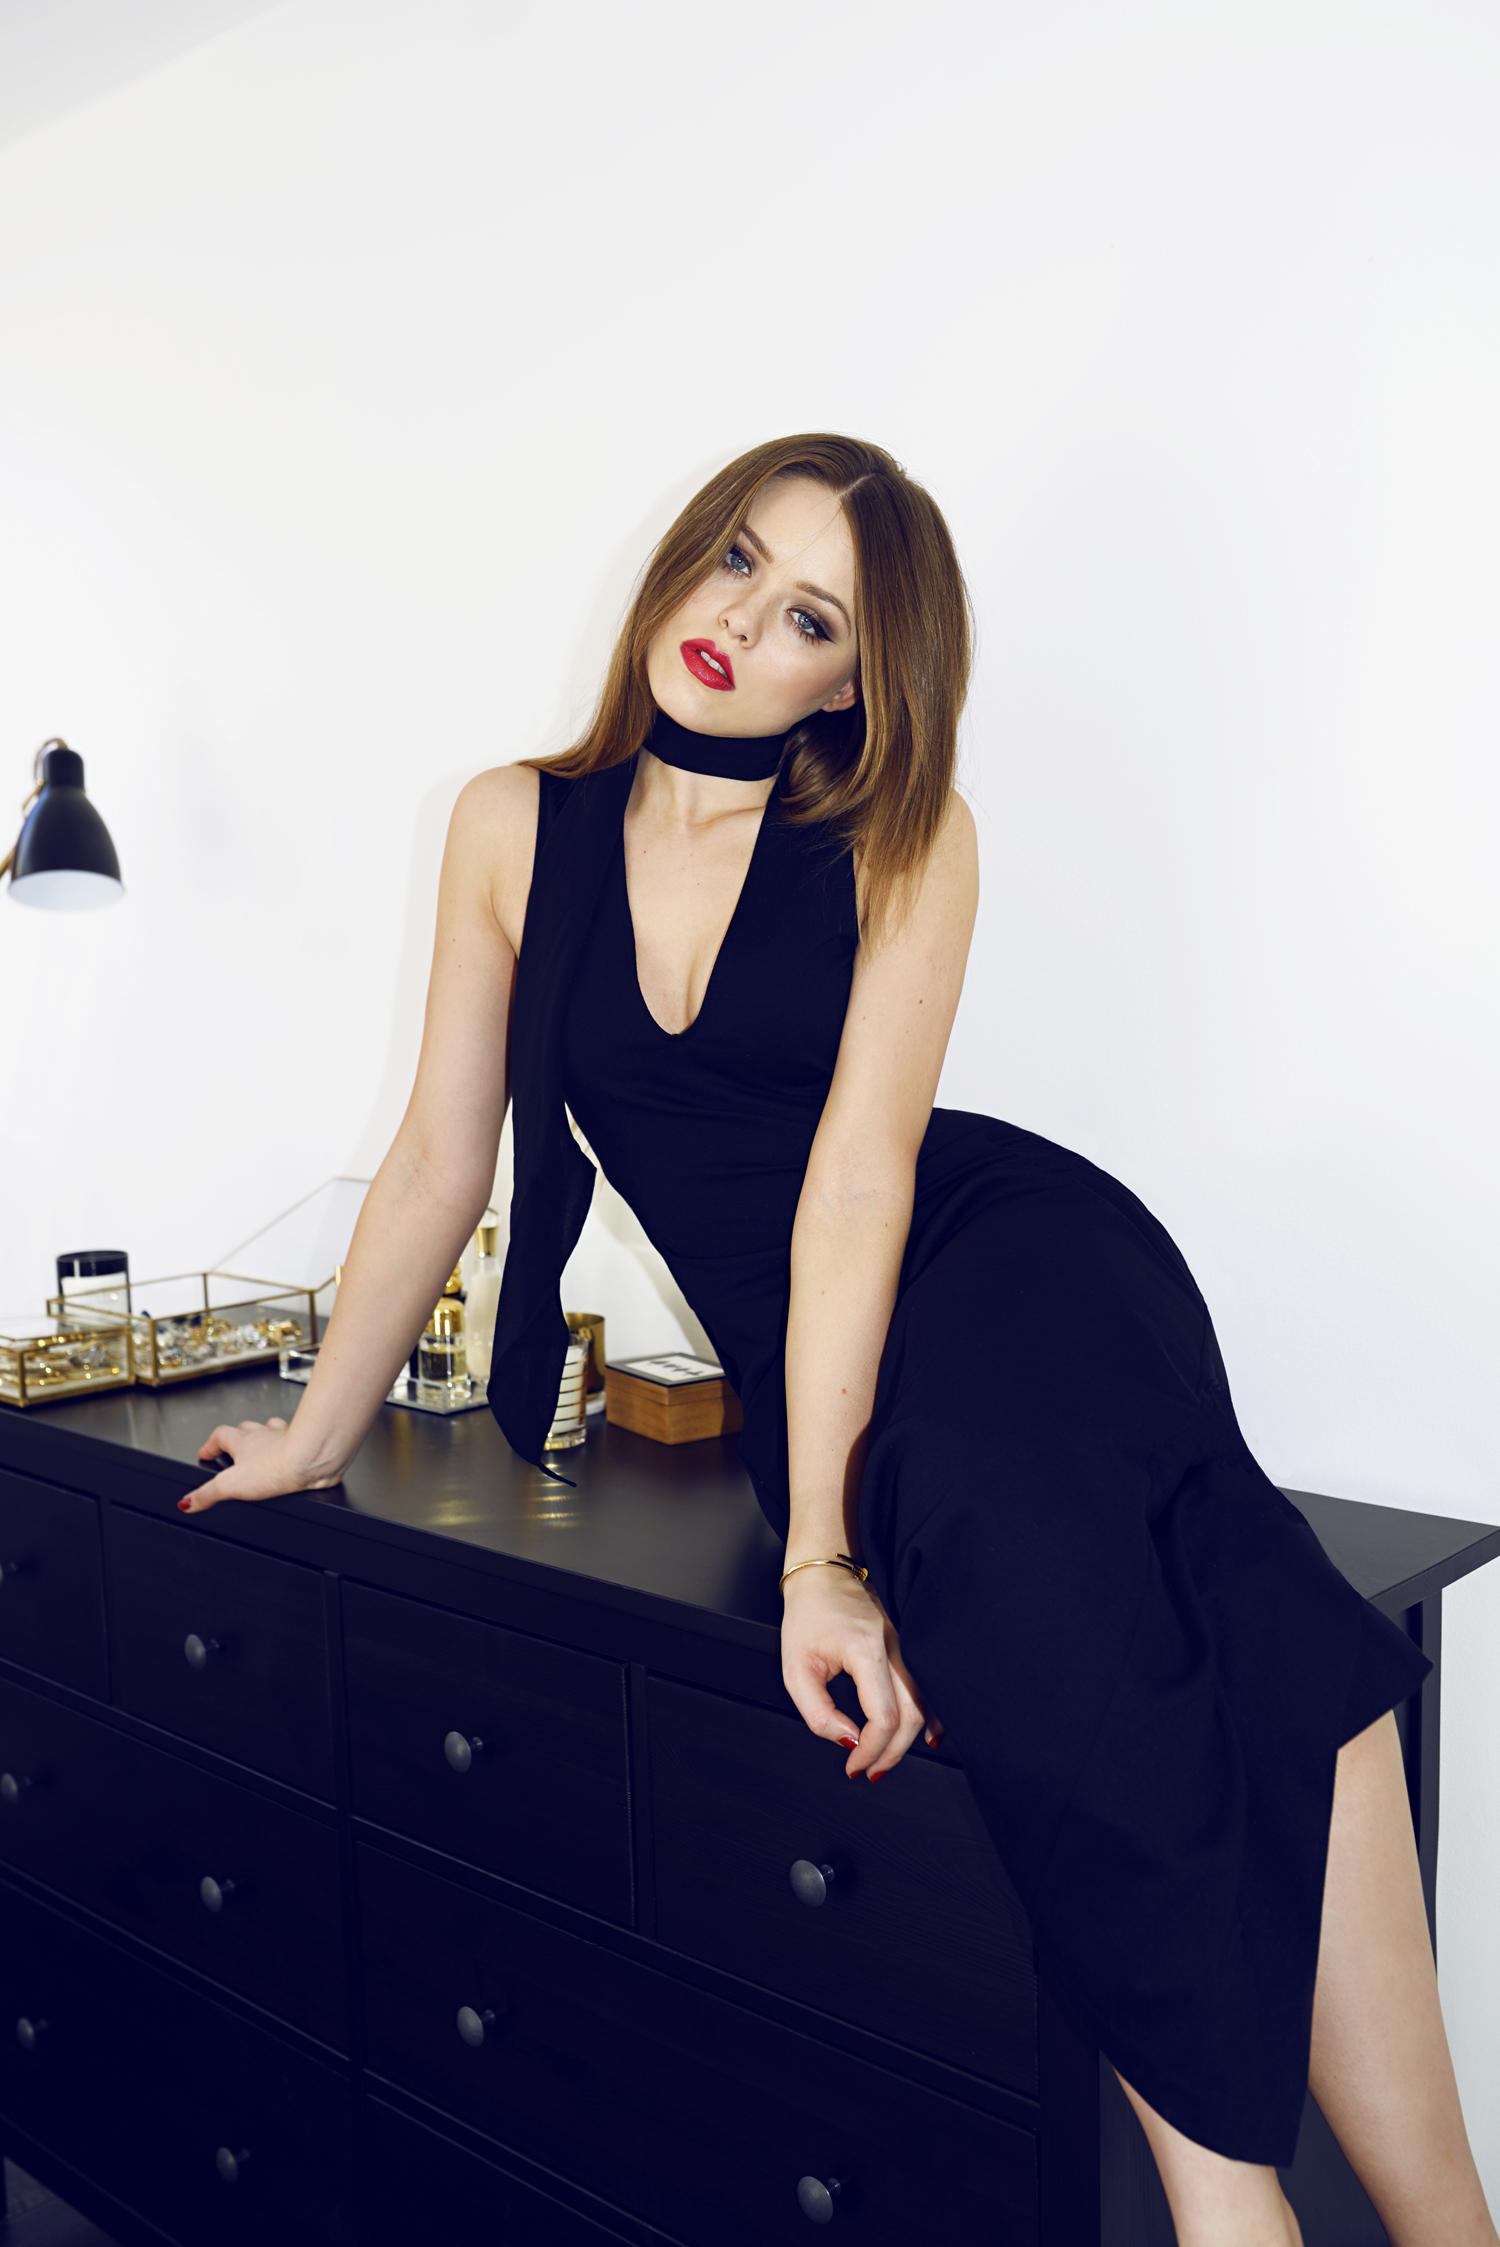 Cibelle x Kristina | ExpressNOVEMBER_02